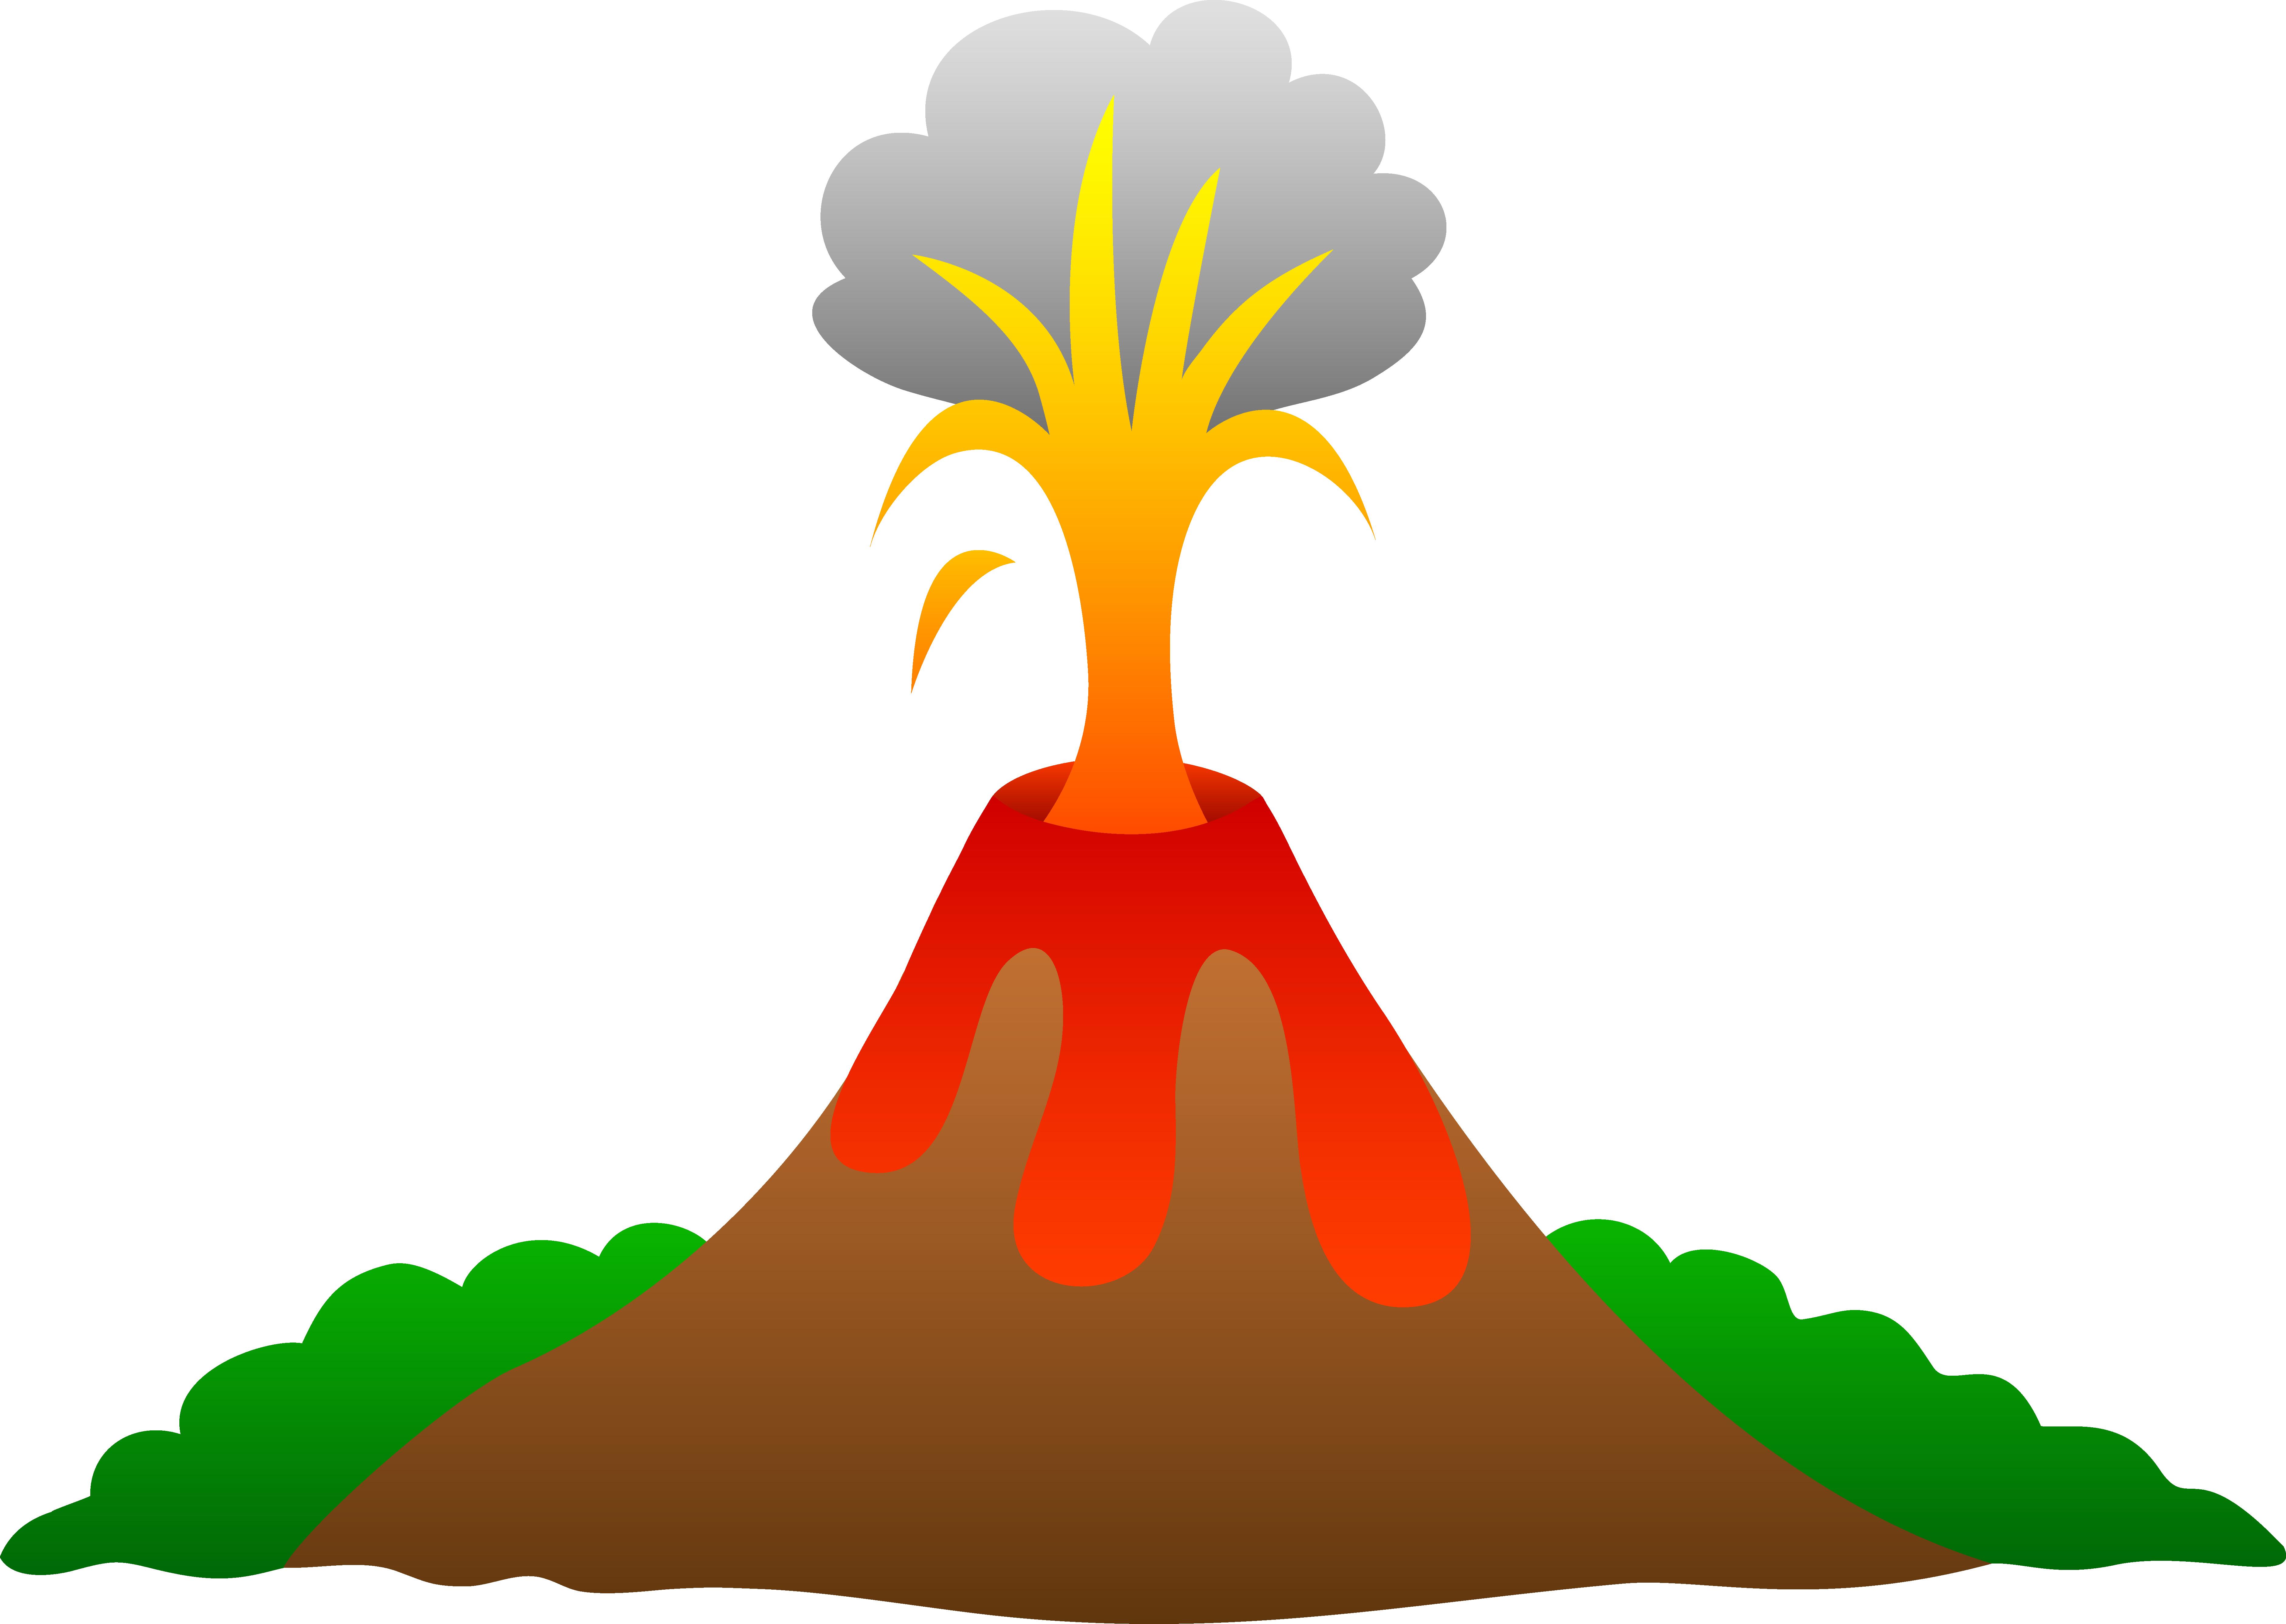 Mount etna clipart #2